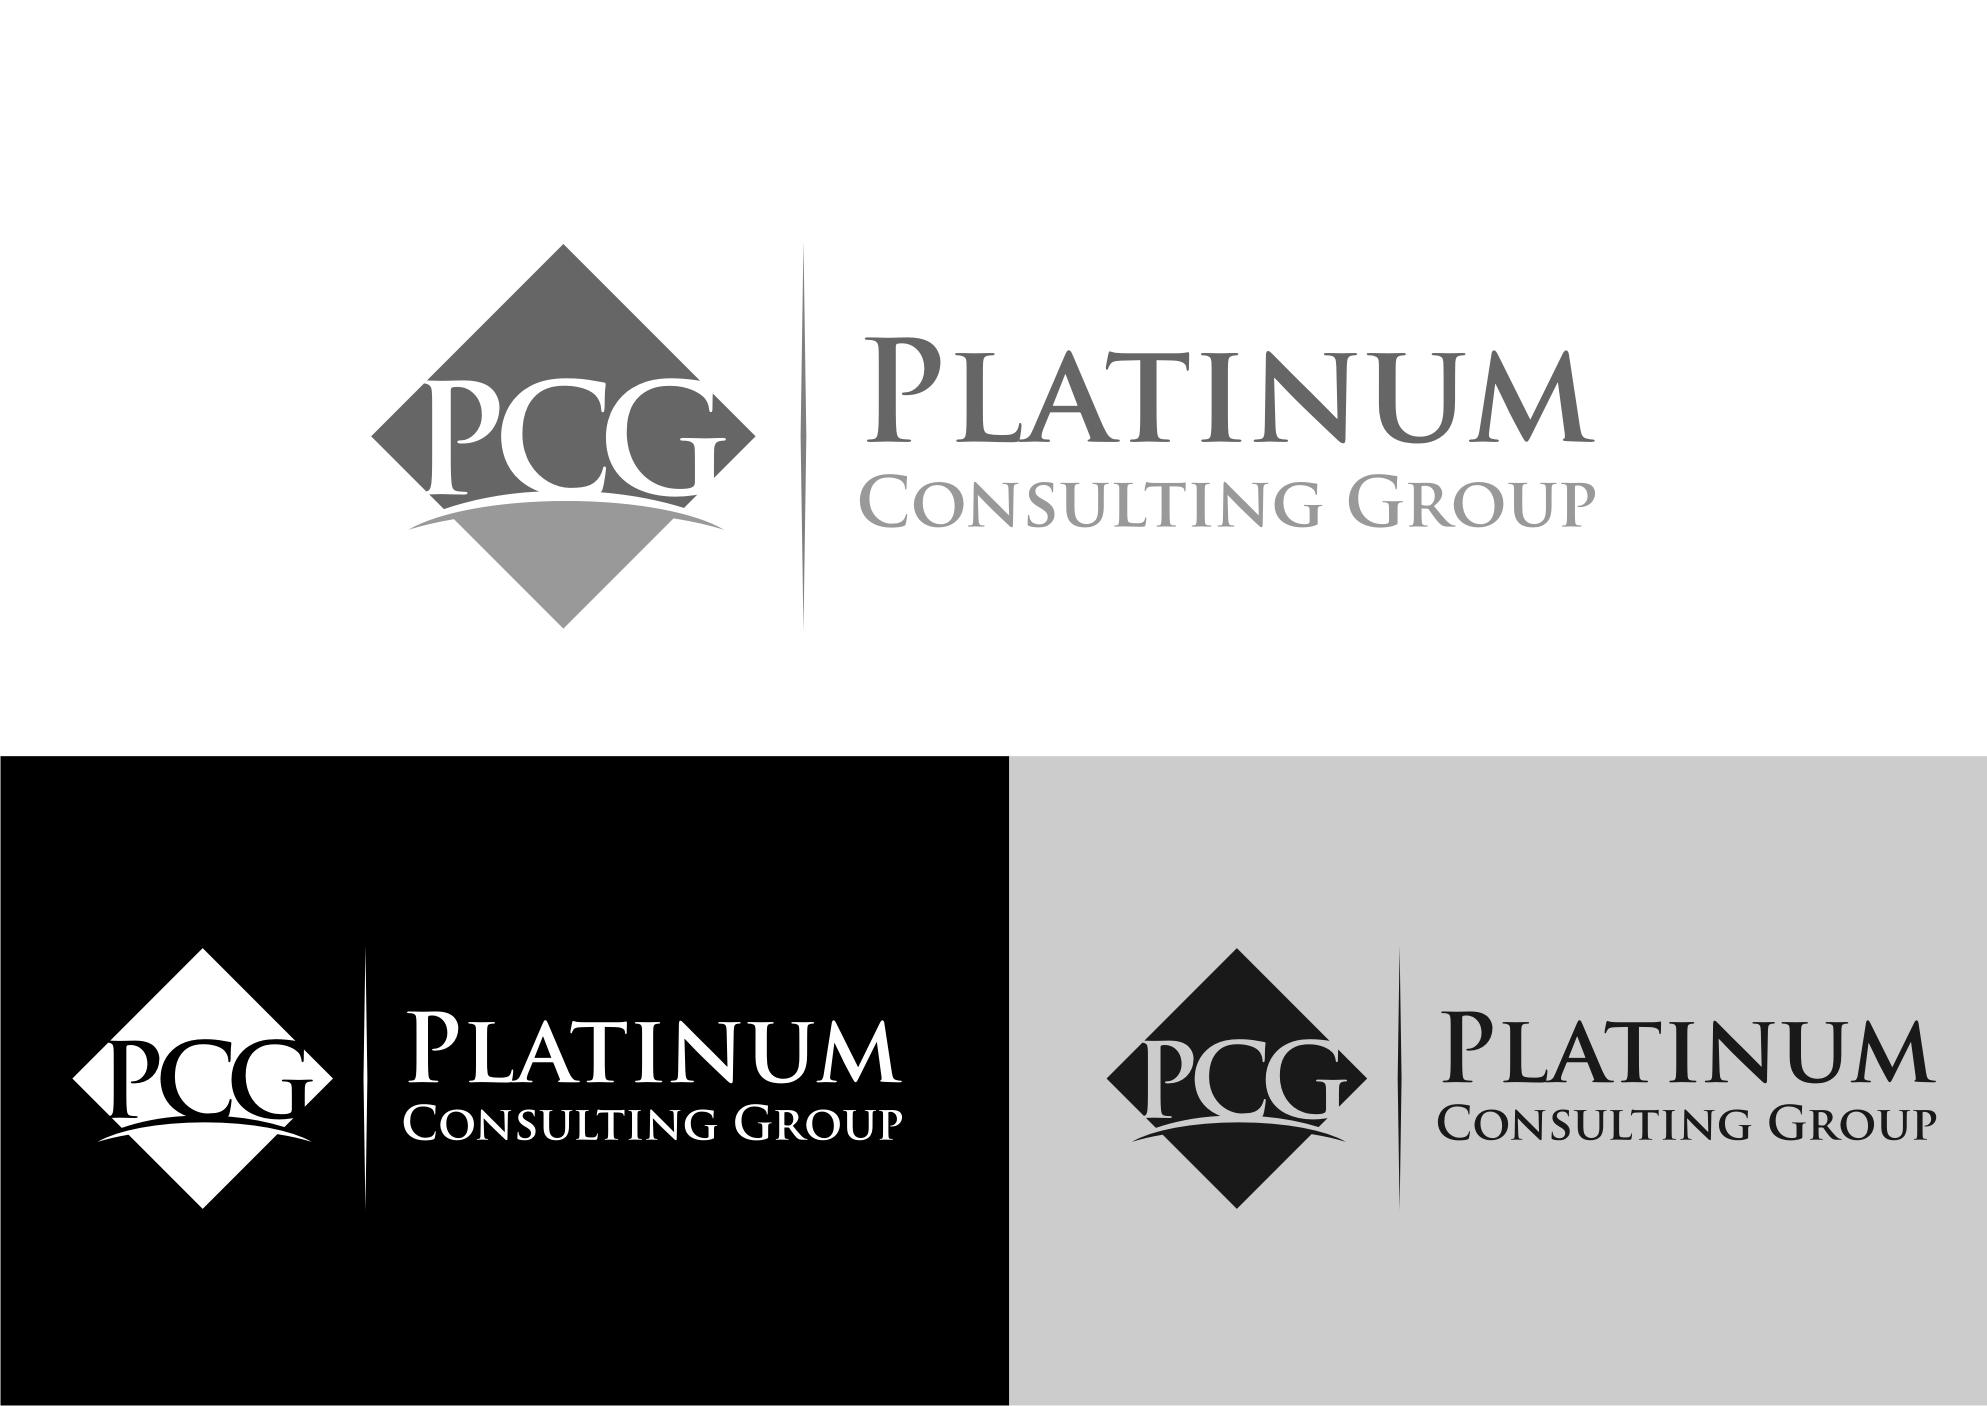 Logo Design by Tille Famz - Entry No. 20 in the Logo Design Contest Captivating Logo Design for Platinum Consulting Group.